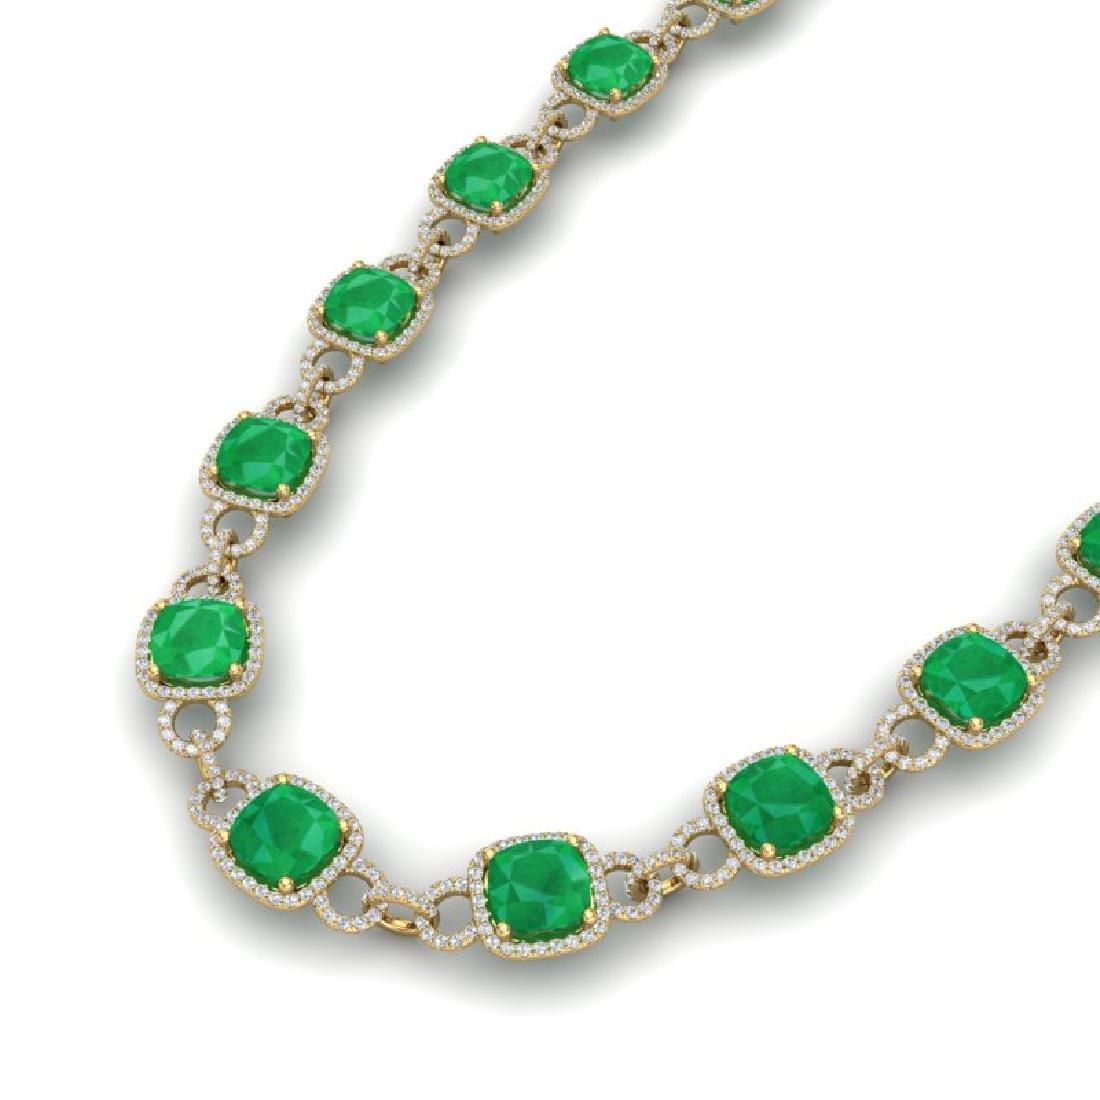 56 CTW Emerald & VS/SI Diamond Necklace 14K Yellow Gold